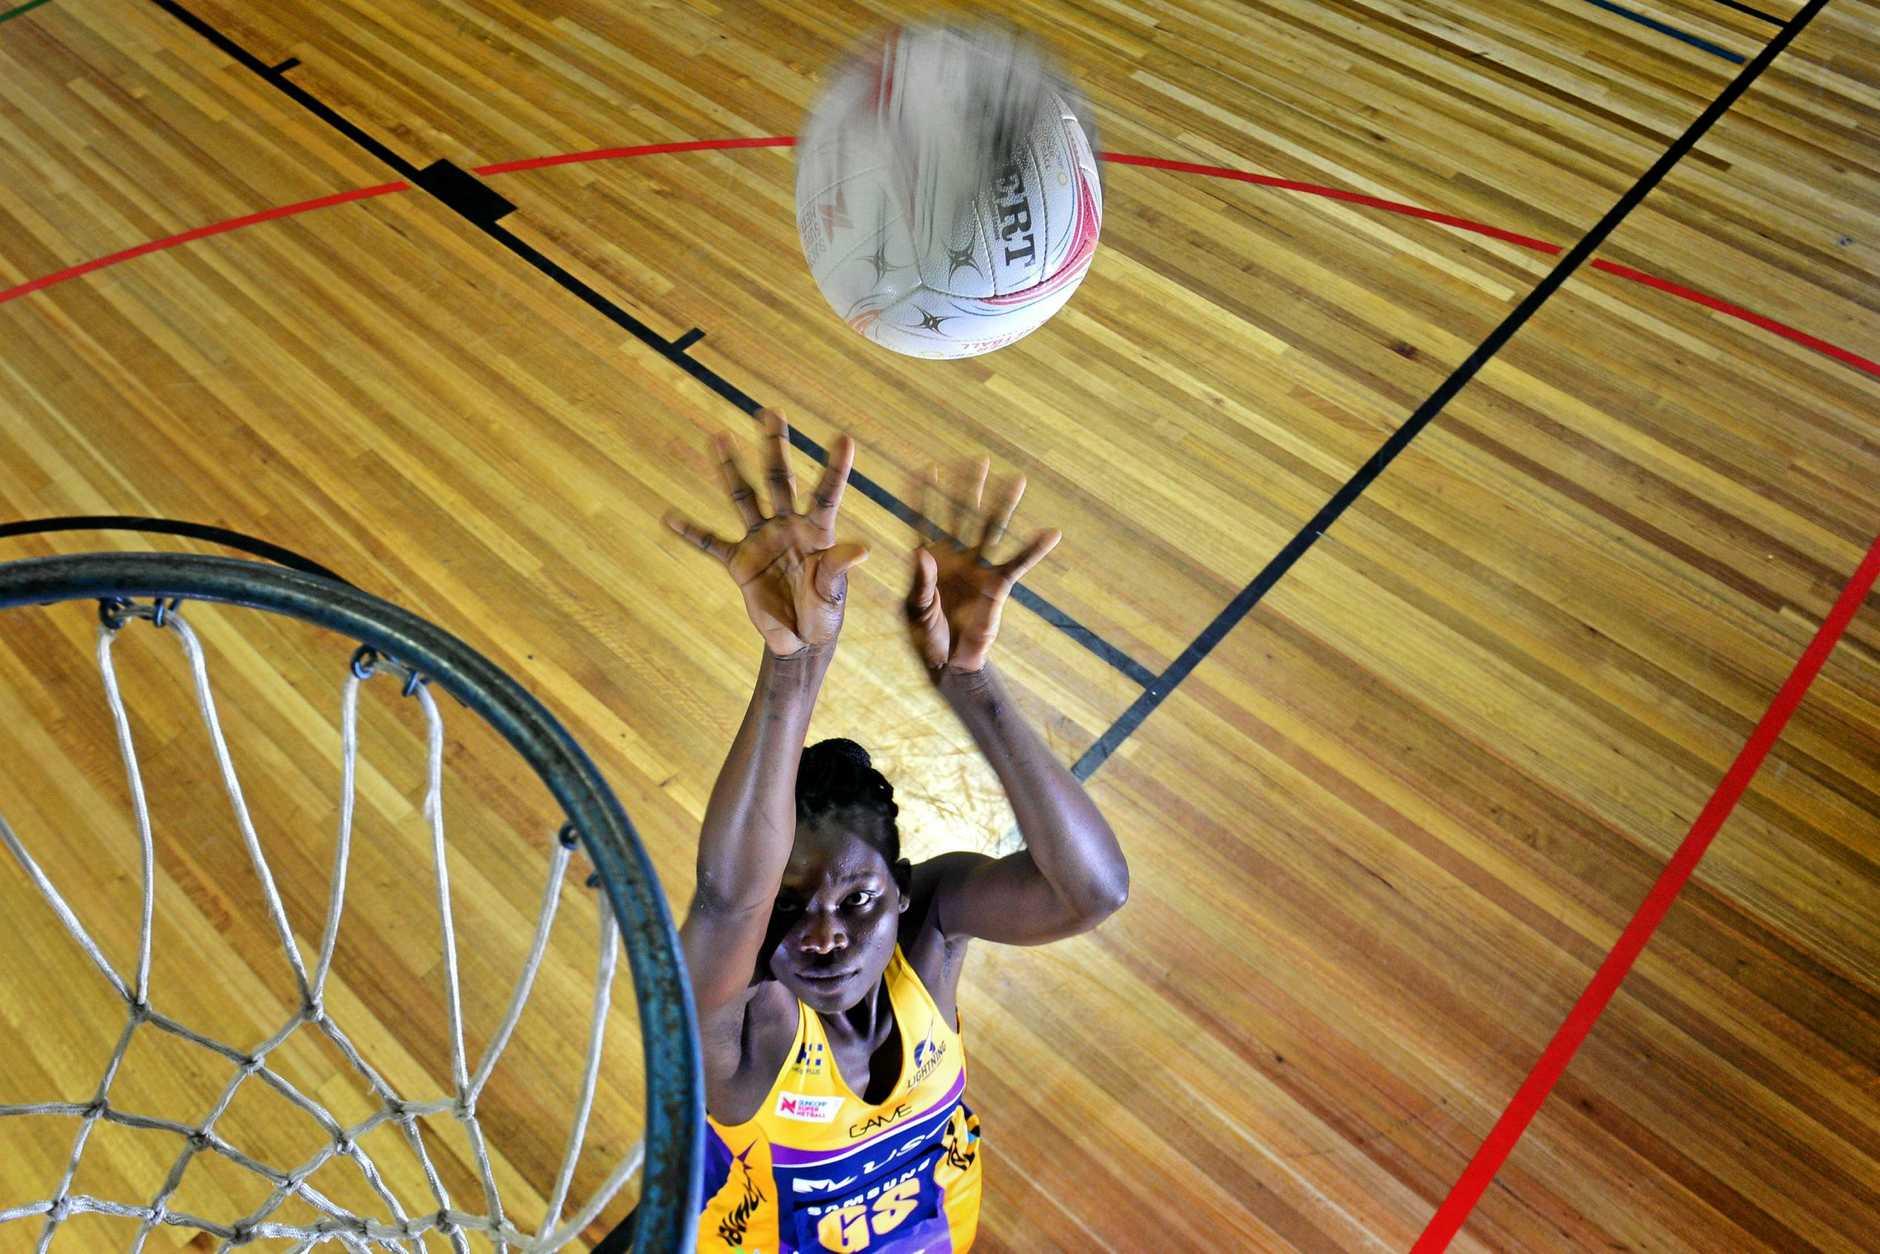 Peace Proscovia Drajole Agondua is a professional Ugandan athlete who plays netball for the Sunshine Coast Lightning in the Australian Super Netball league